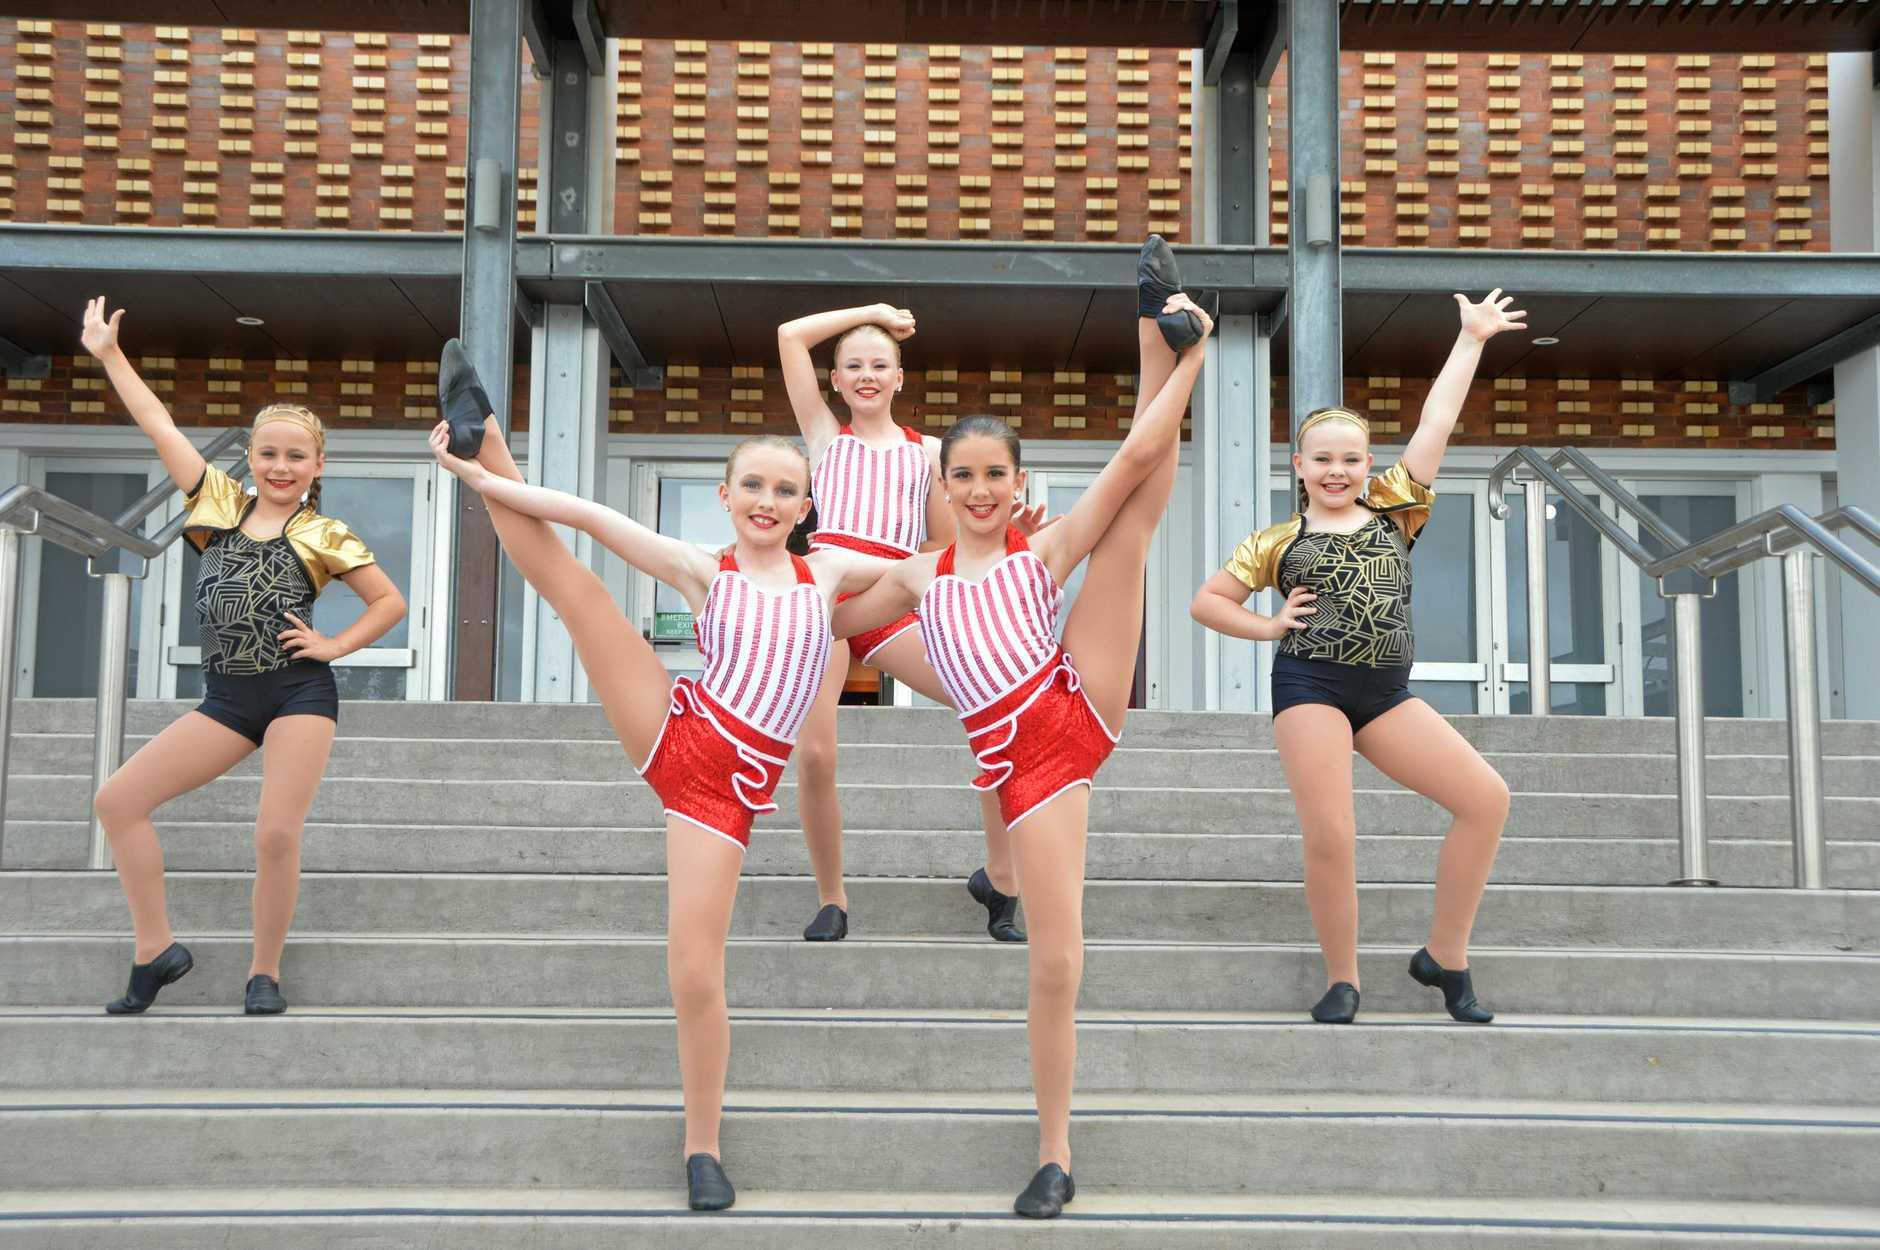 SINING BRIGHT: Kingaroy dancers Poppy Oram, Poppy Jeffs, Molly Oram, Josie Perrett and Billie-Kate Stead loved being on stage at the Kingaroy eisteddfod.